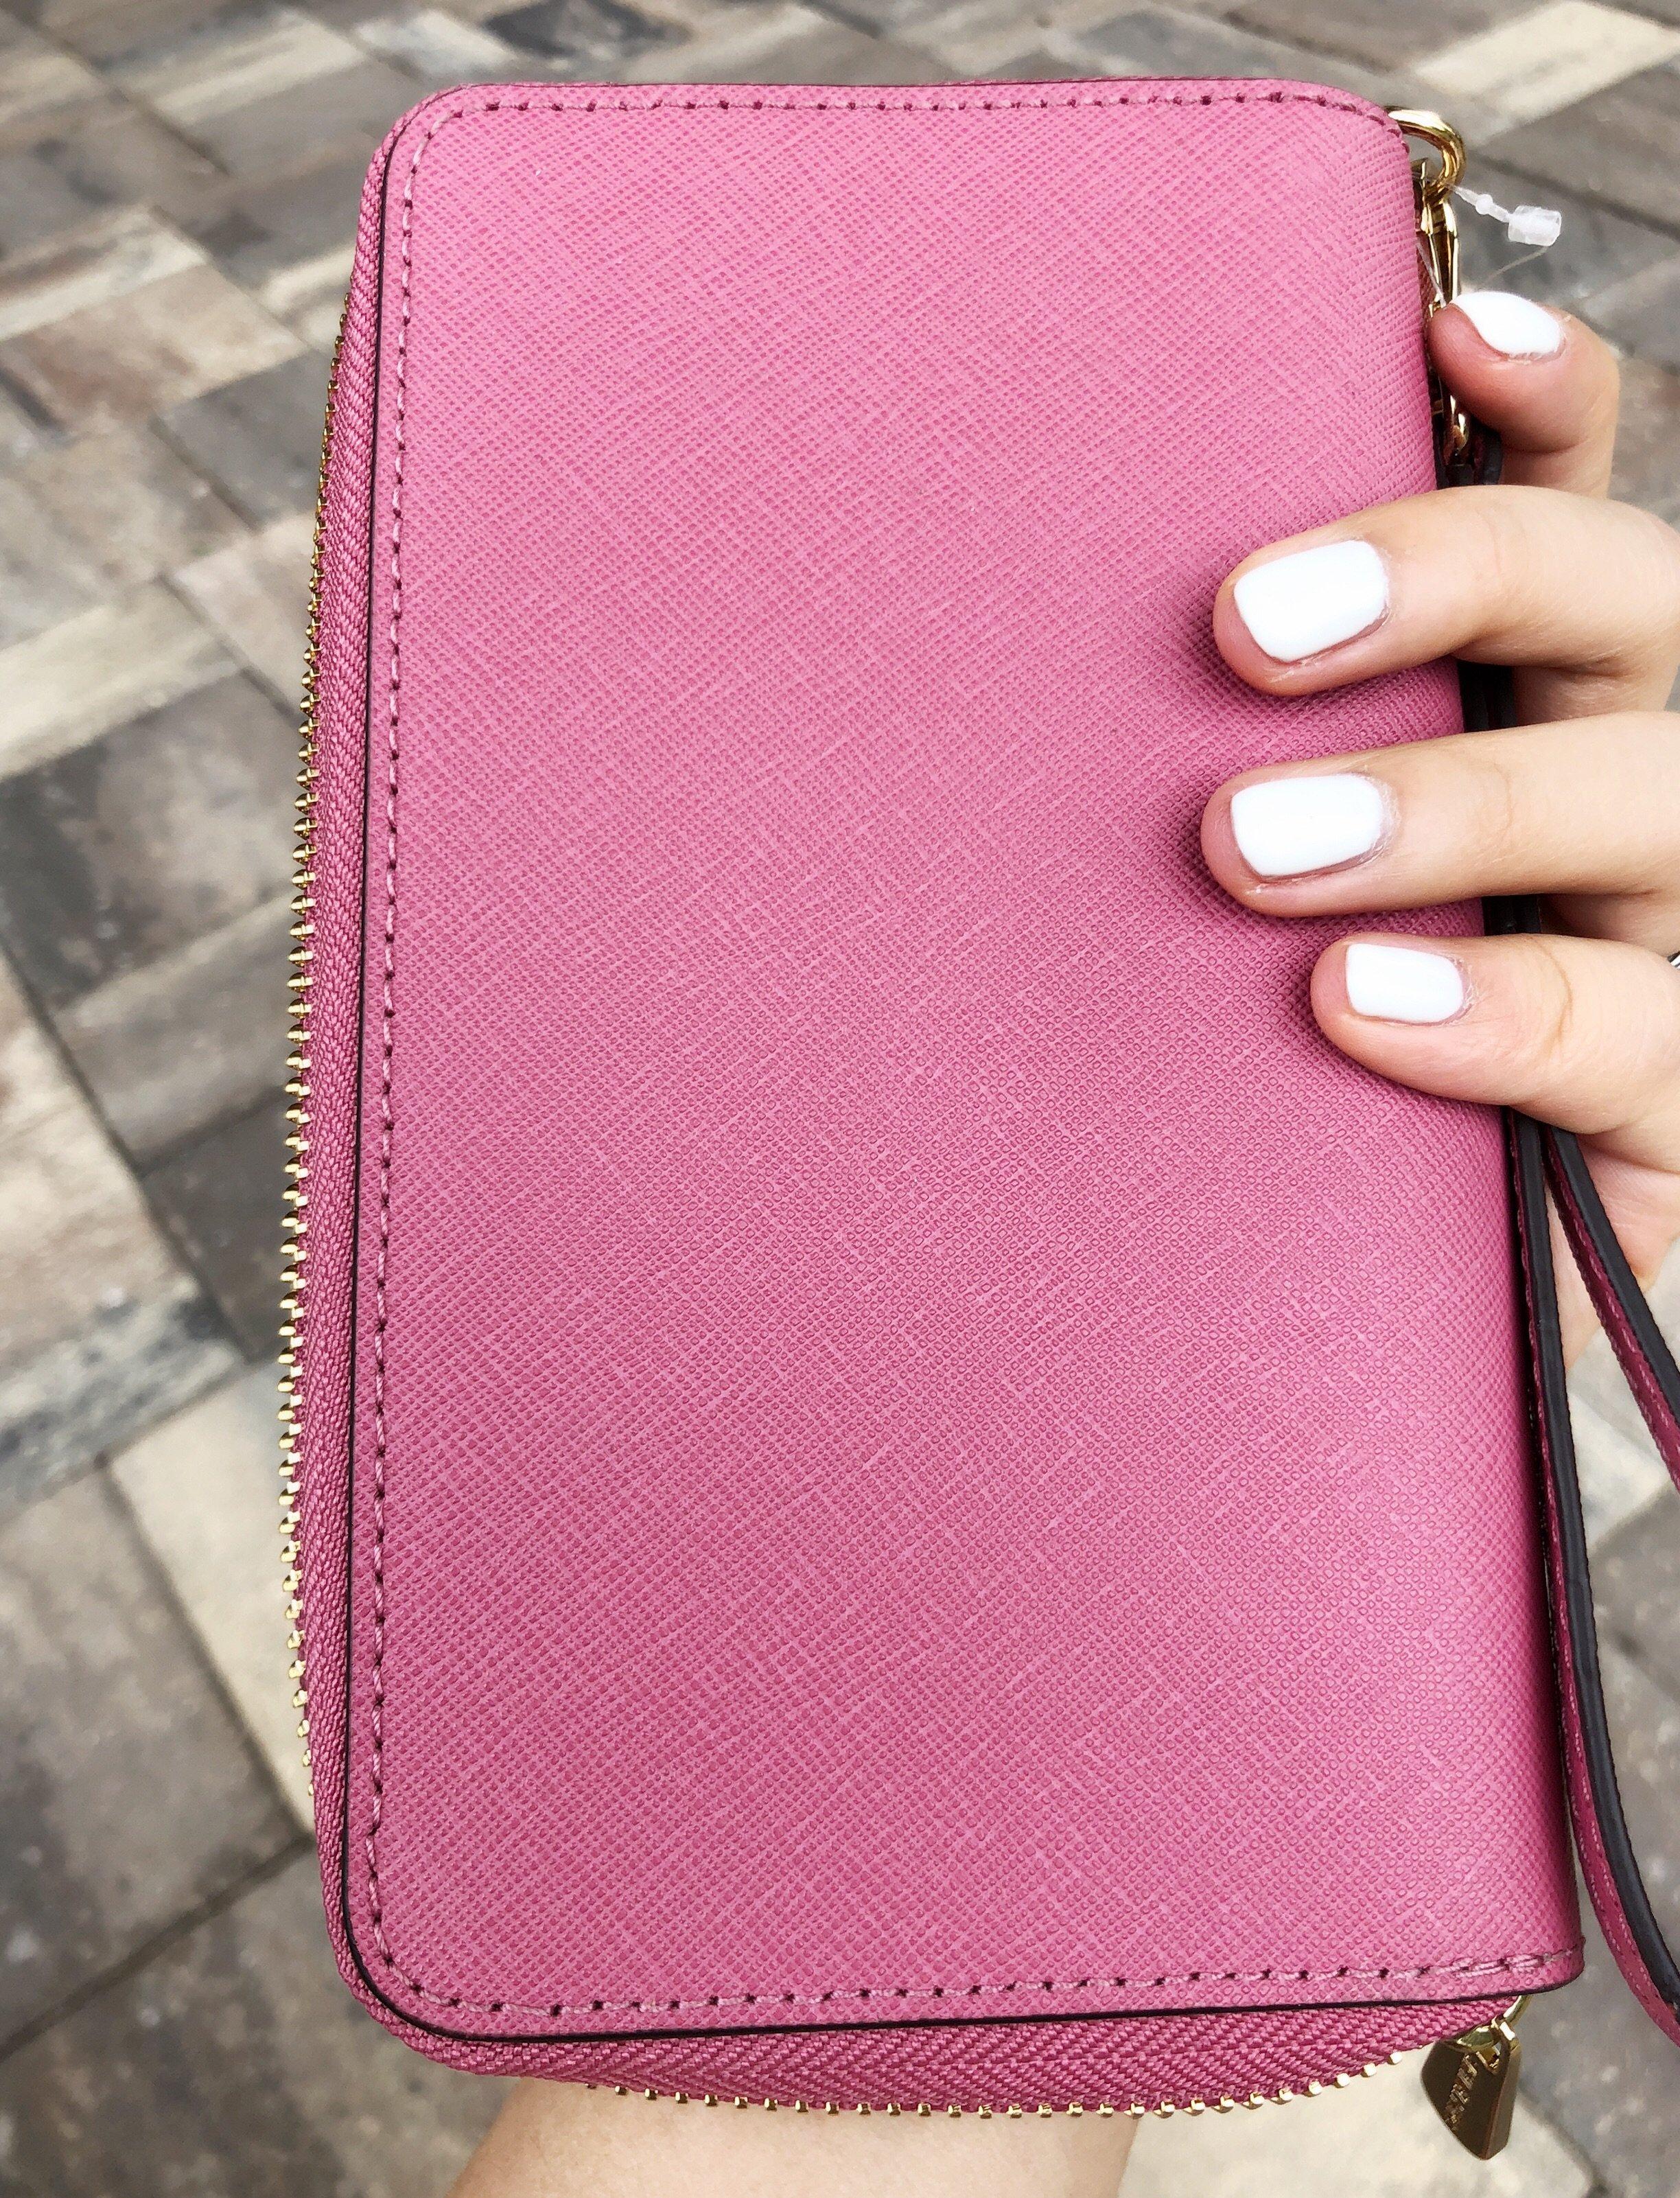 9f7db9ddc0dd Michael Kors Jet Set Travel Wallet Phone Wristlet Tulip Pink Floral ...